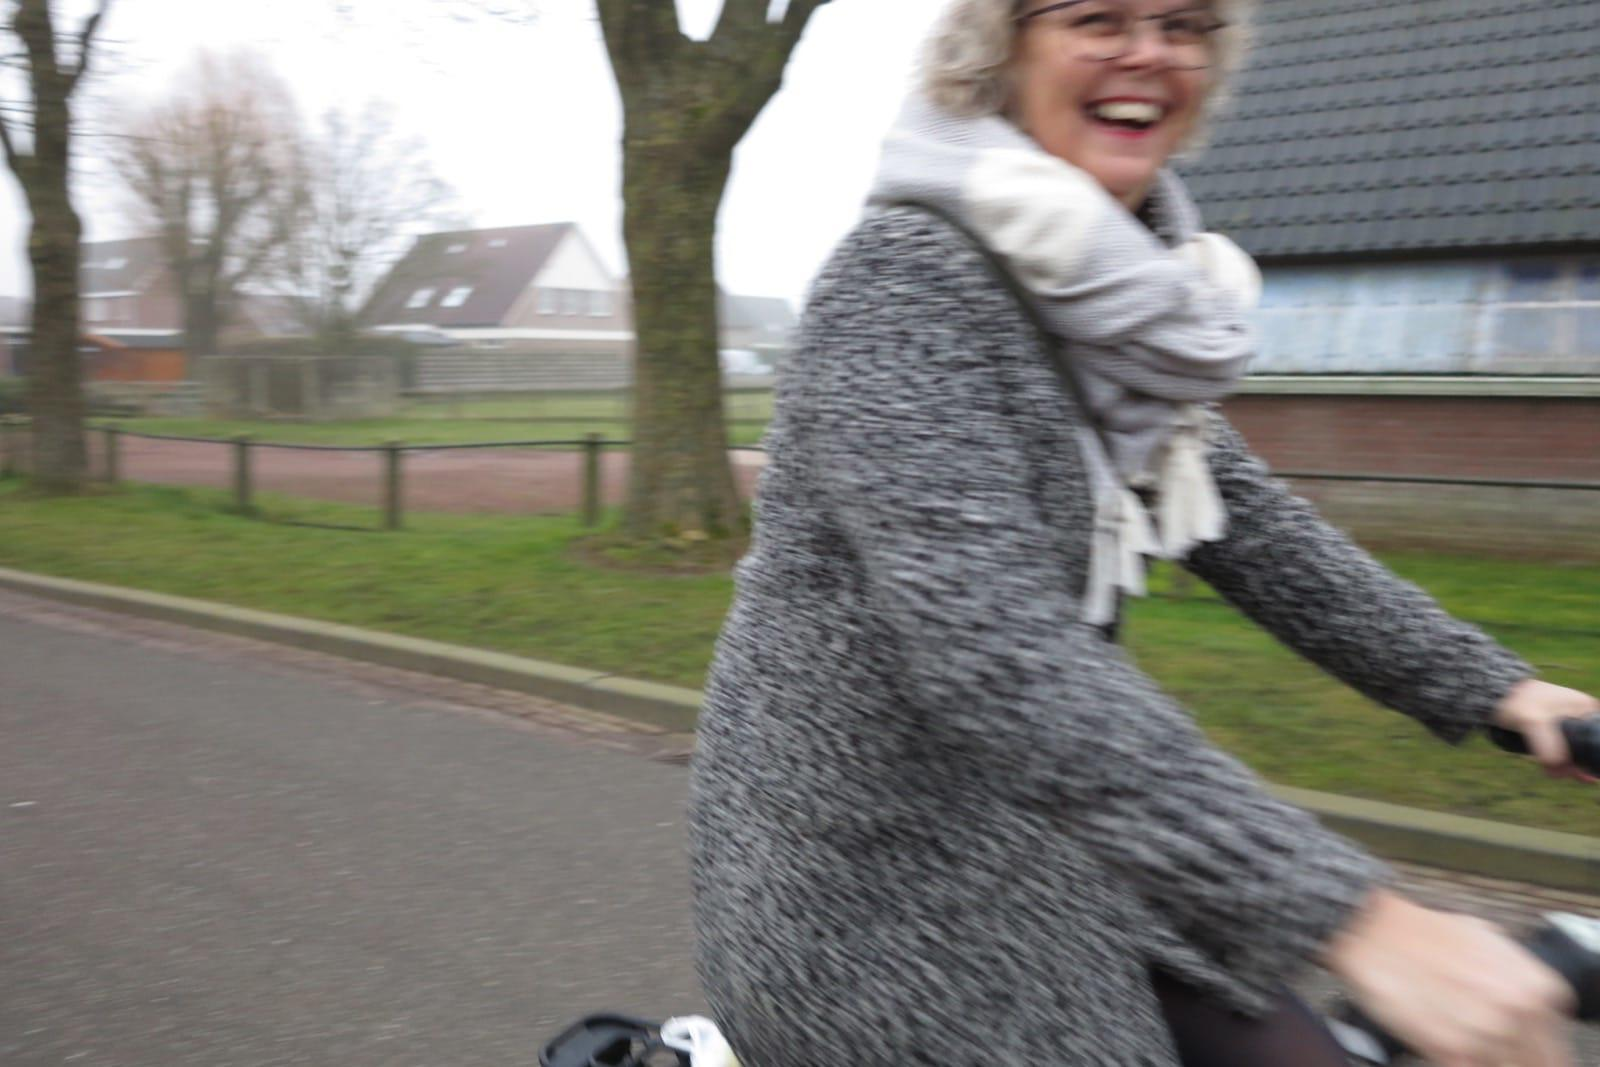 et-fiets-en-fietser-17--johanna-van-zanten-oi.jpg